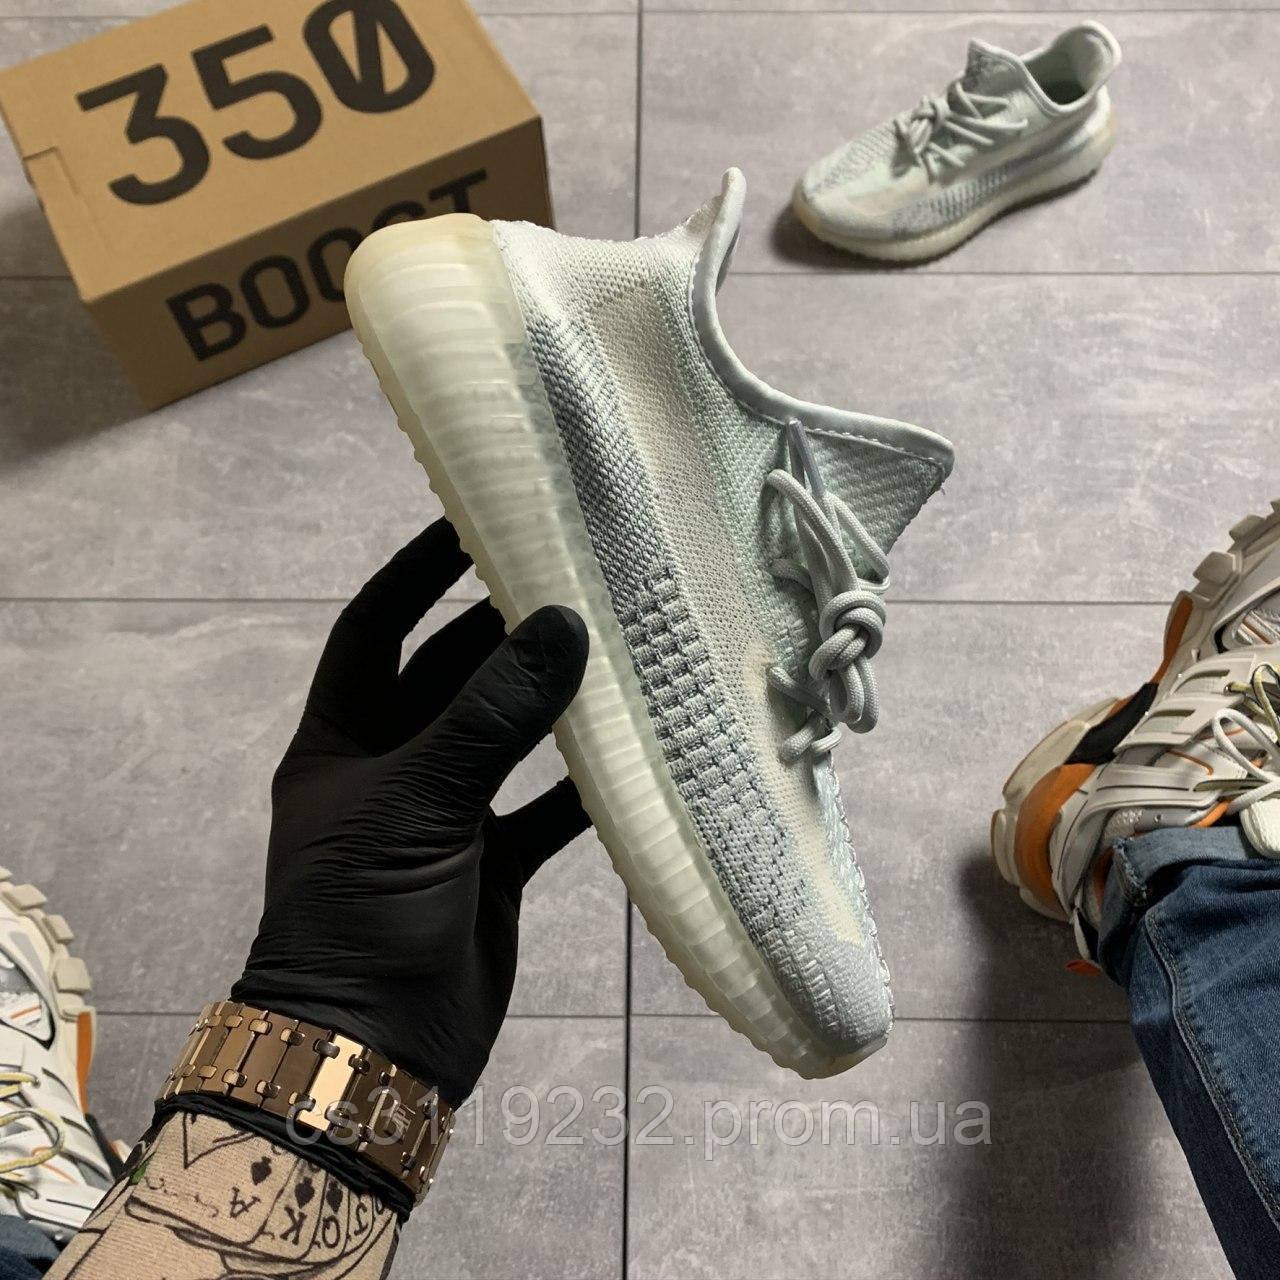 Мужские кроссовки Adidas Yeezy Boost 350 V2 Cloud White (белые)